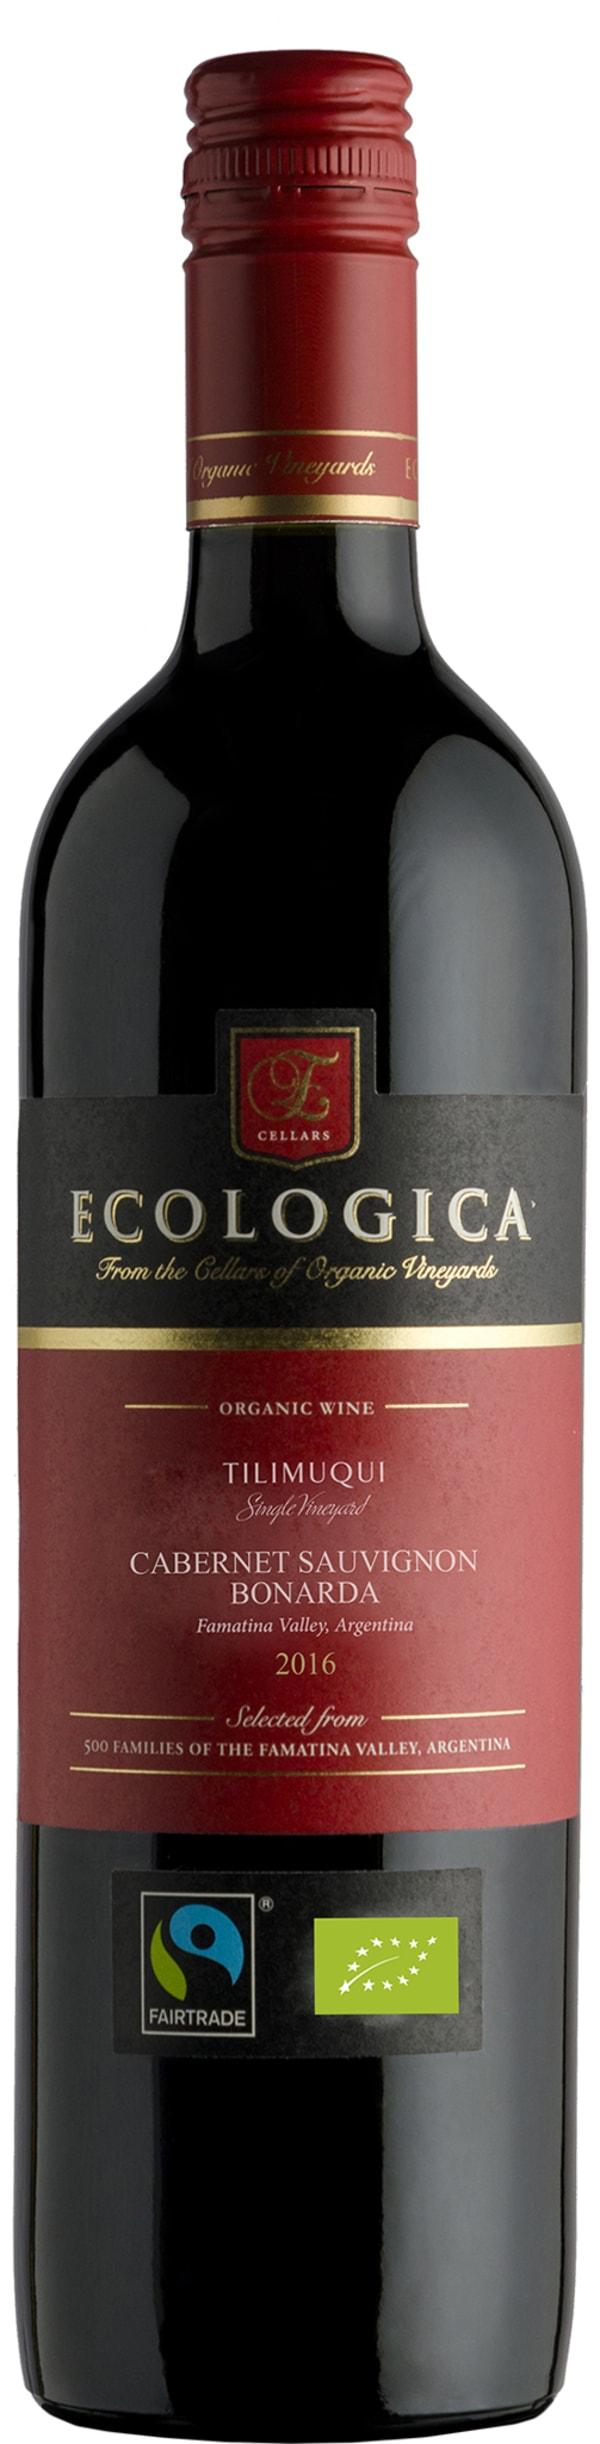 Ecologica Tilimuqui Single Vineyard Cabernet Sauvignon Bonarda  2016